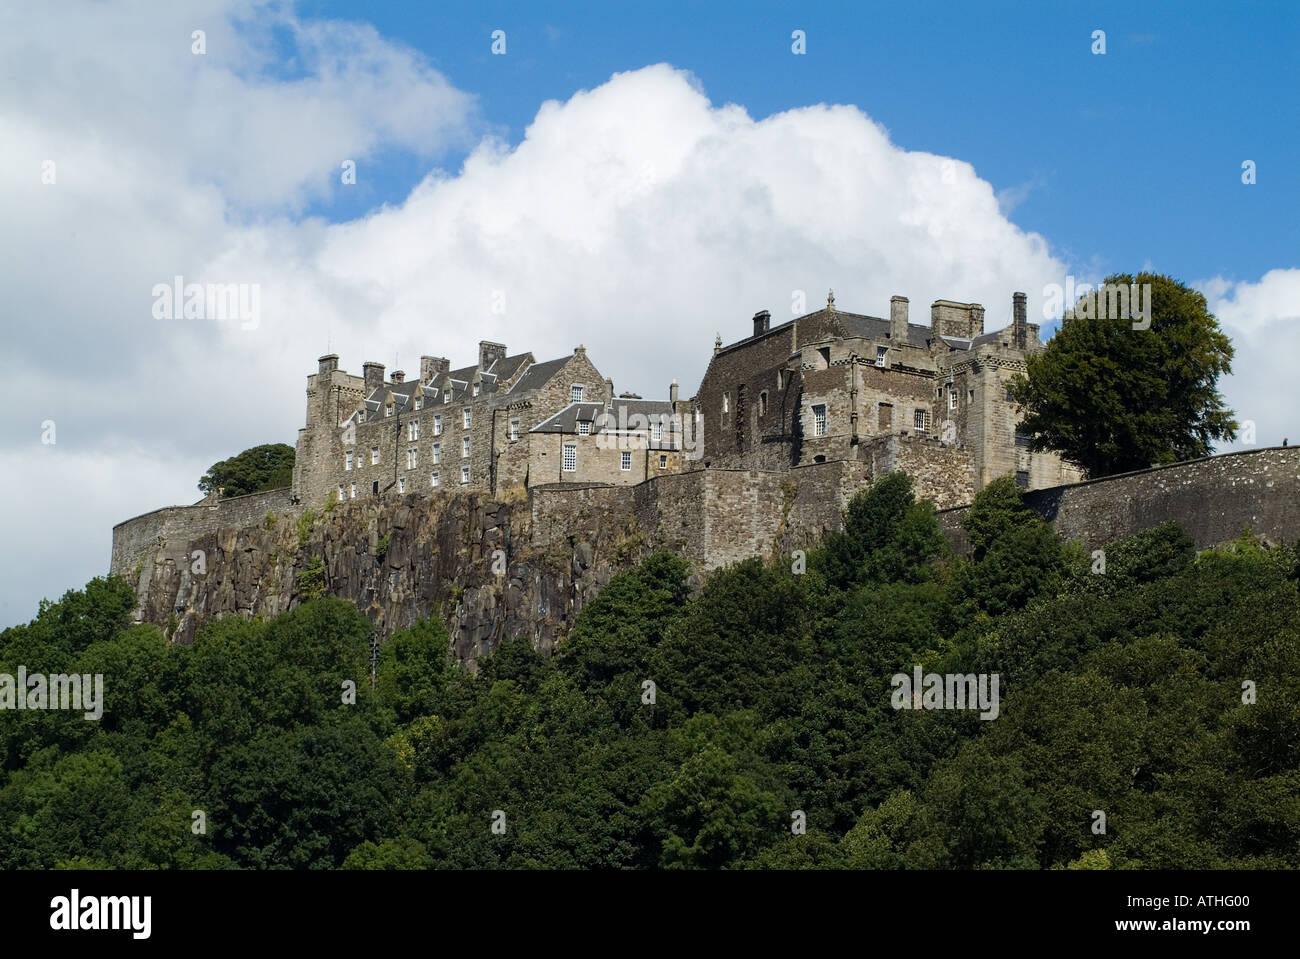 Dh Castillo Stirling STIRLING Castillos de Escocia STIRLINGSHIRE sitios históricos histórico de Escocia Foto de stock